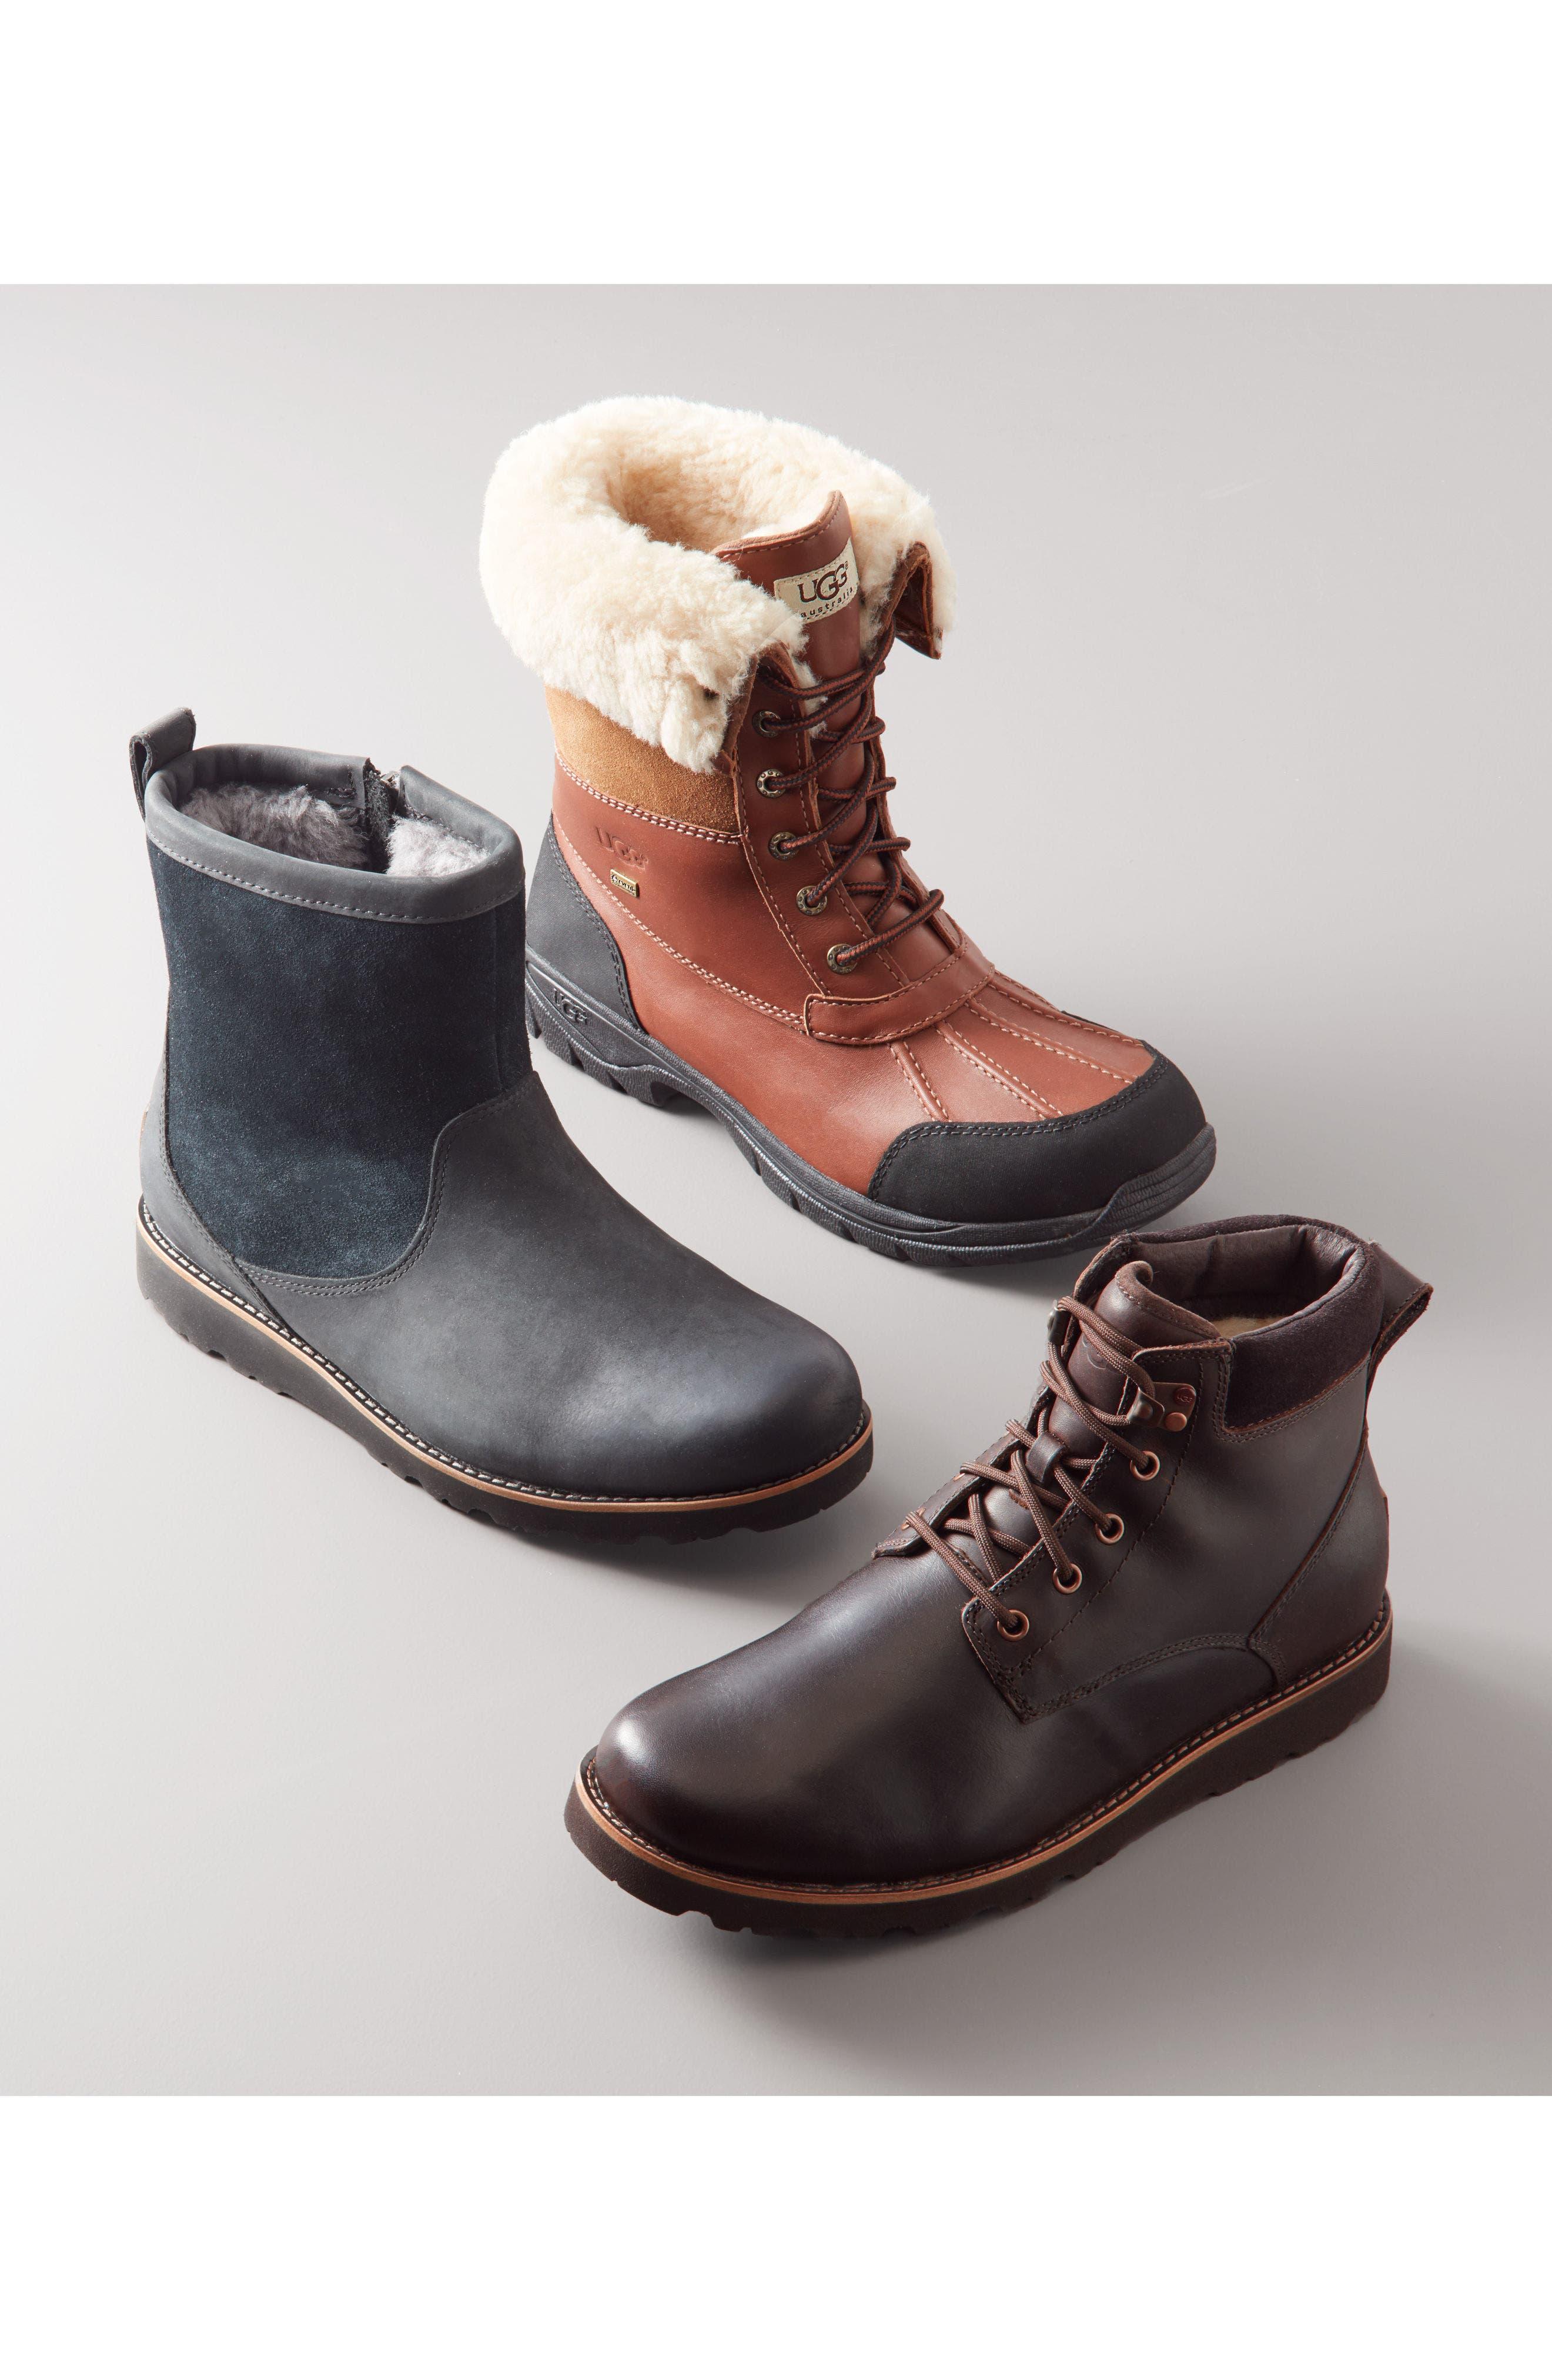 Seton Waterproof Chukka Boot,                             Alternate thumbnail 11, color,                             WHEAT